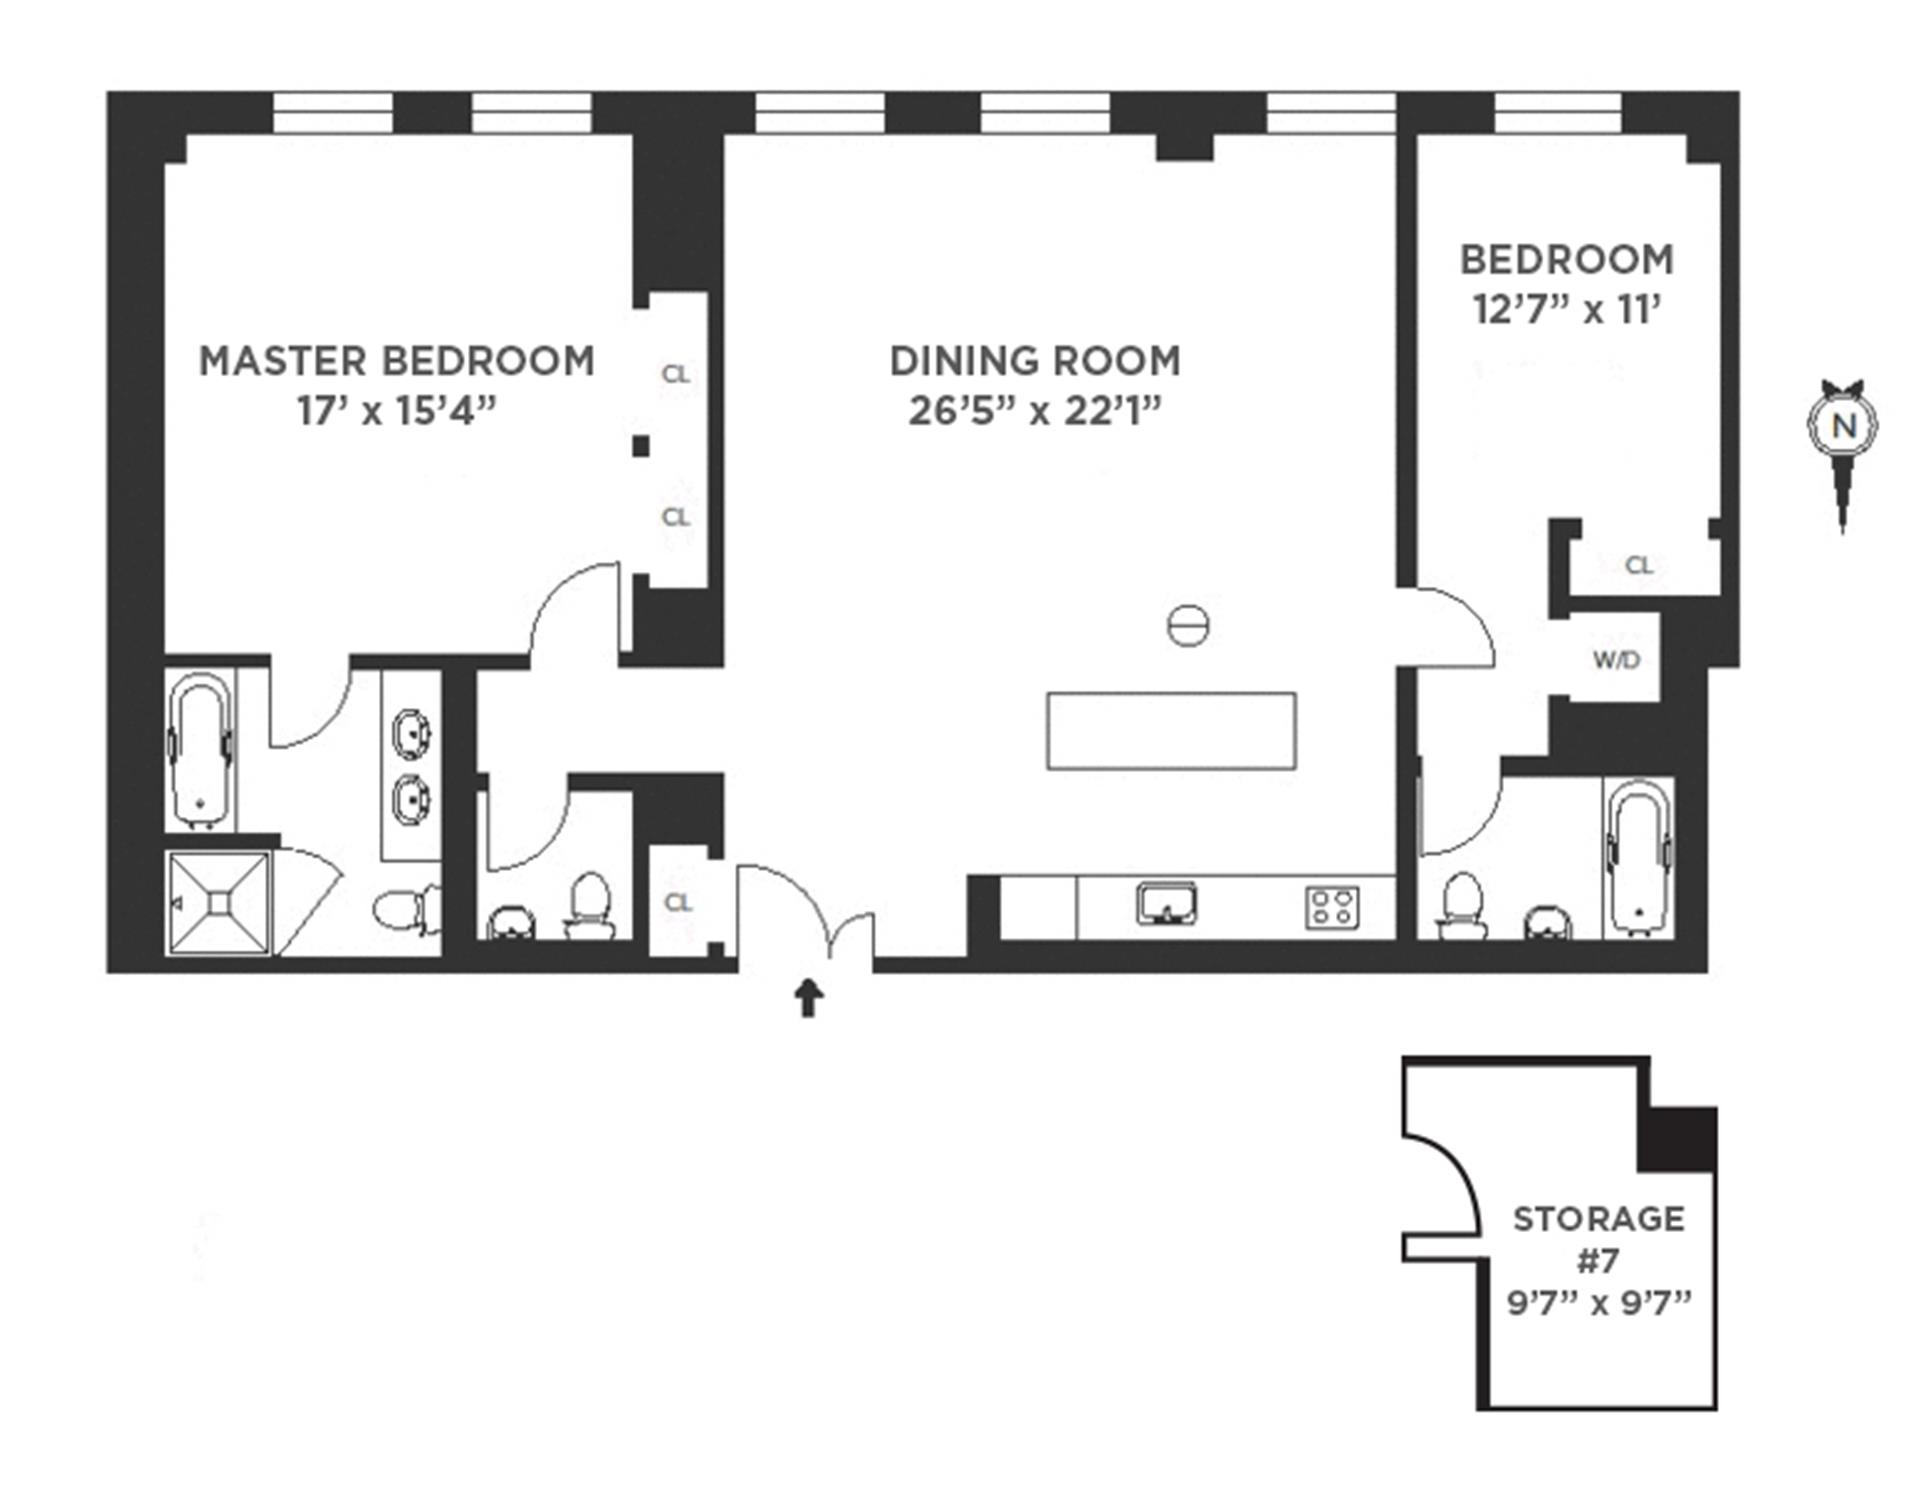 Floor plan of The Grand Madison, 225 Fifth Avenue, 4M - Flatiron District, New York